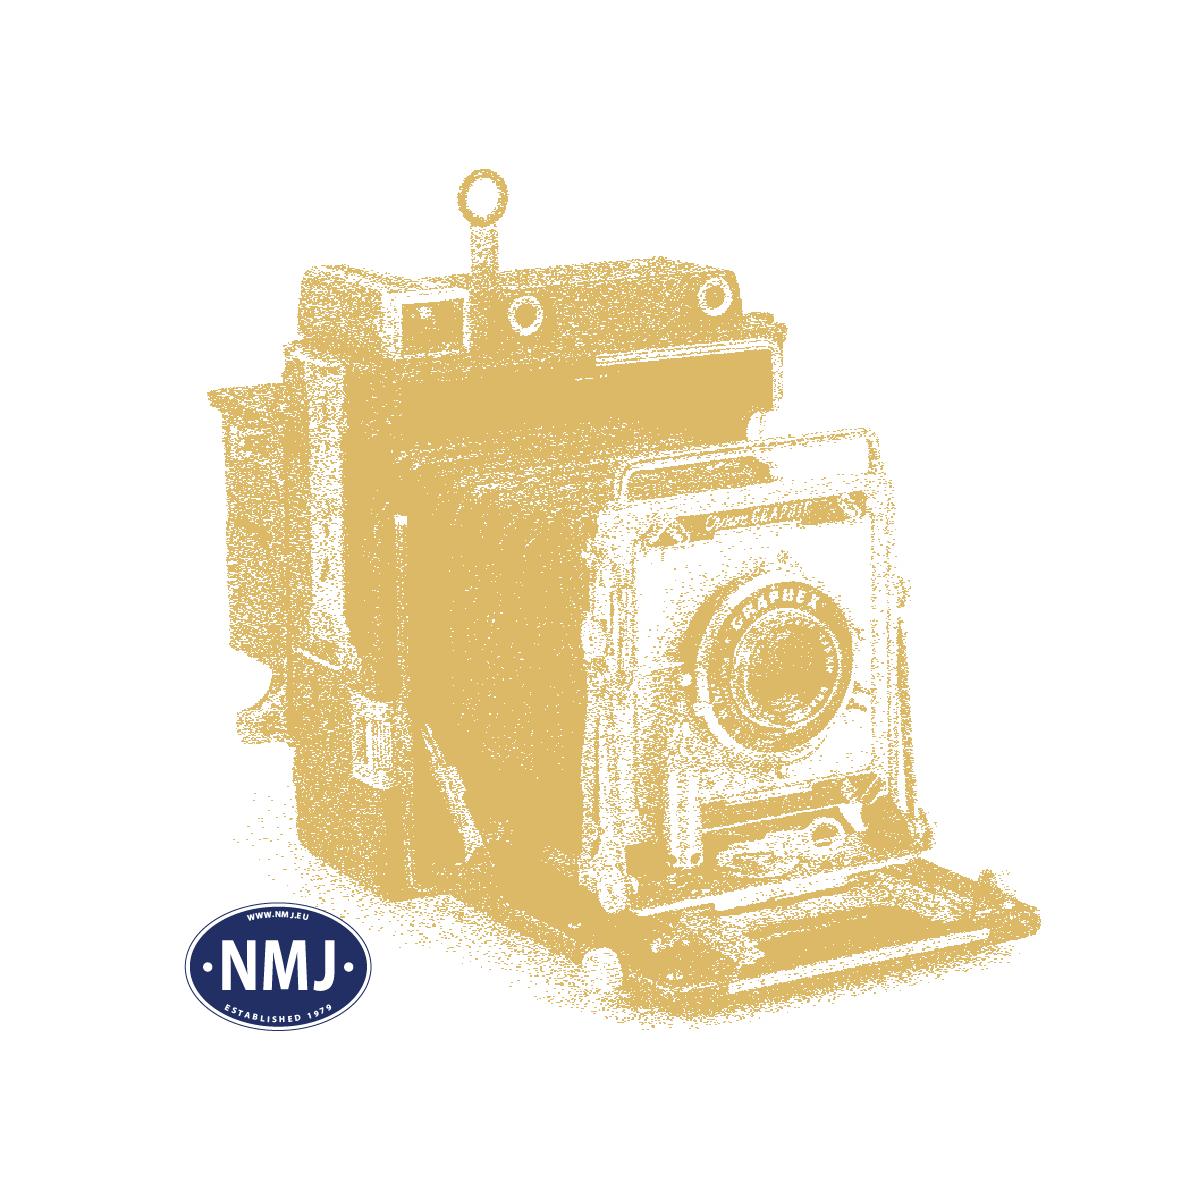 NMJT90011 - NMJ Topline NSB Di3a 617, Red/Brown Livery, DC